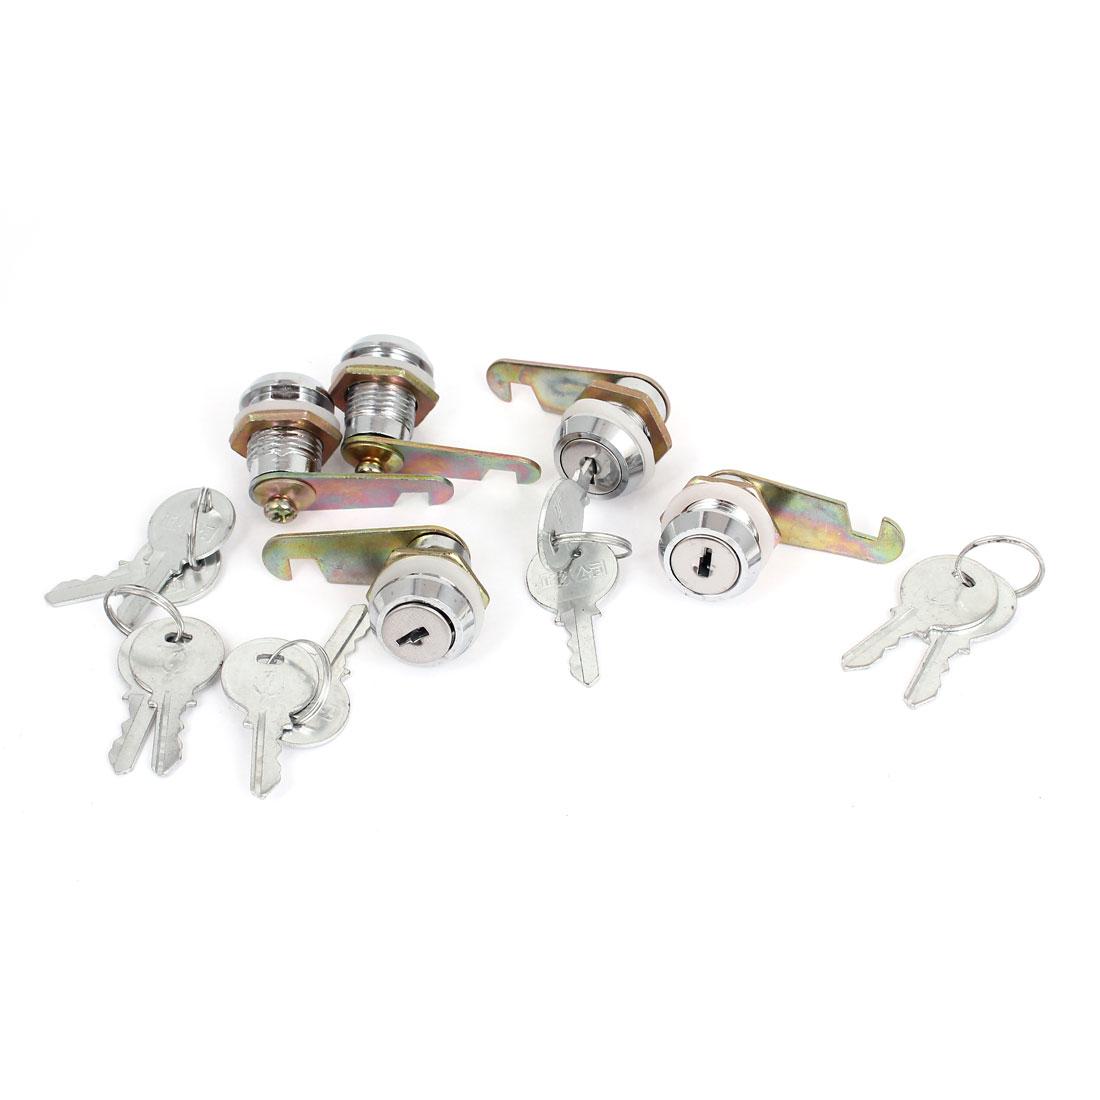 Cabinet Mailbox Toolbox Drawer 17.5mm Dia Thread Shaft Tubular Cam Lock 5pcs